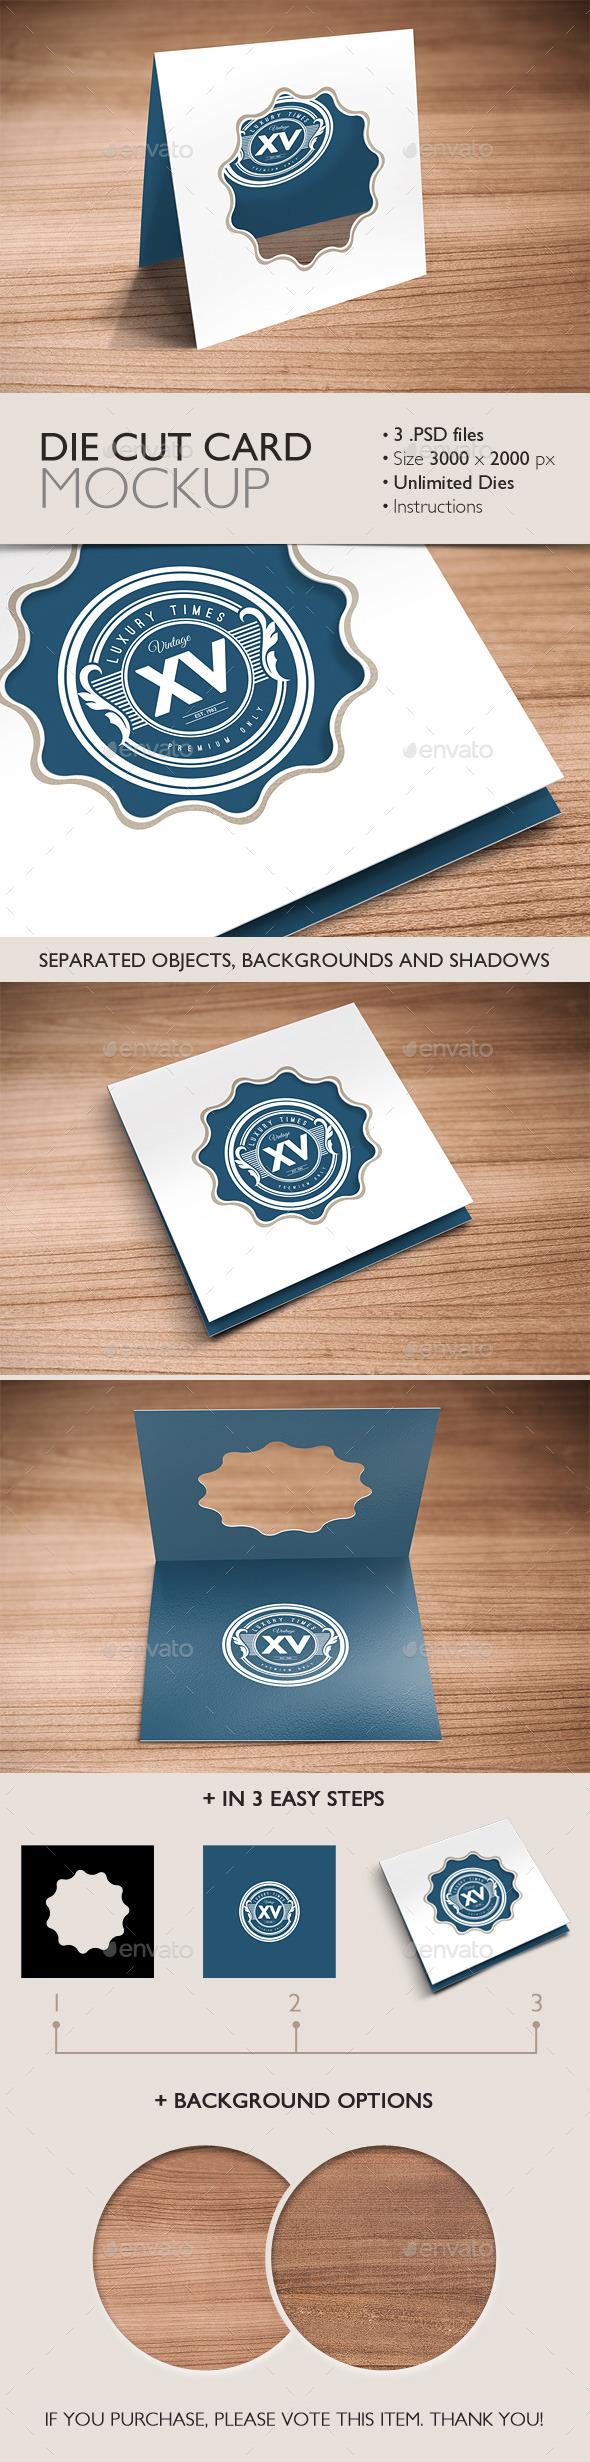 Die Cut Card Mockup - Product Mock-Ups Graphics